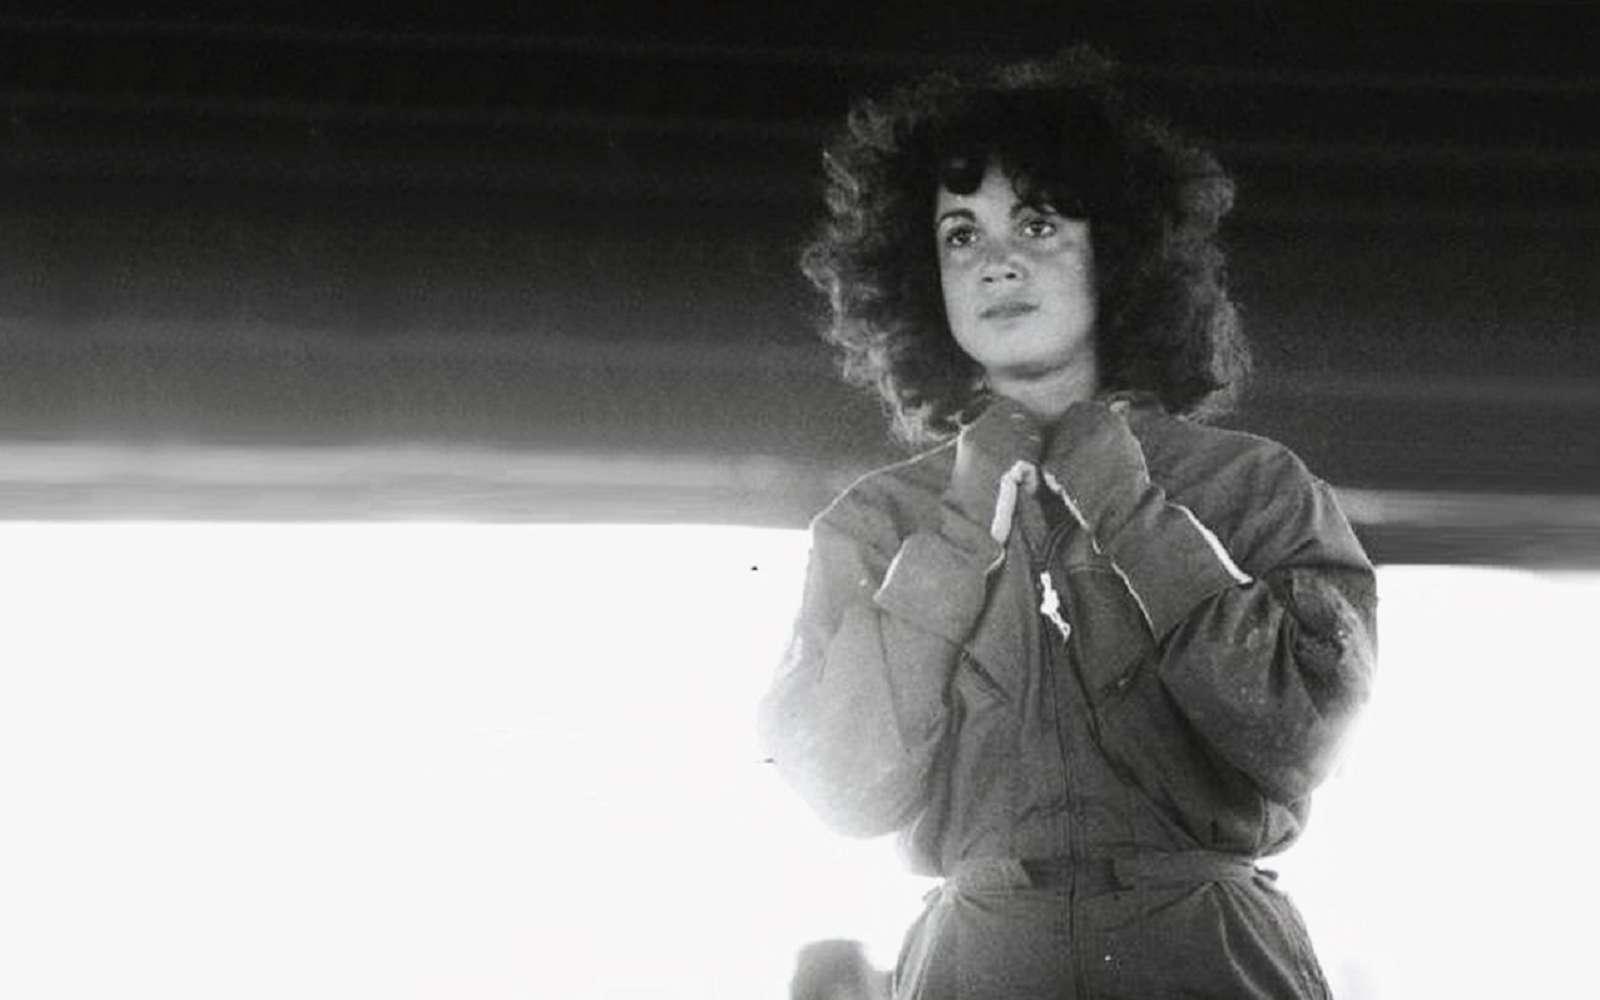 Judith Resnik lors de la mission Discovery. © Nasa